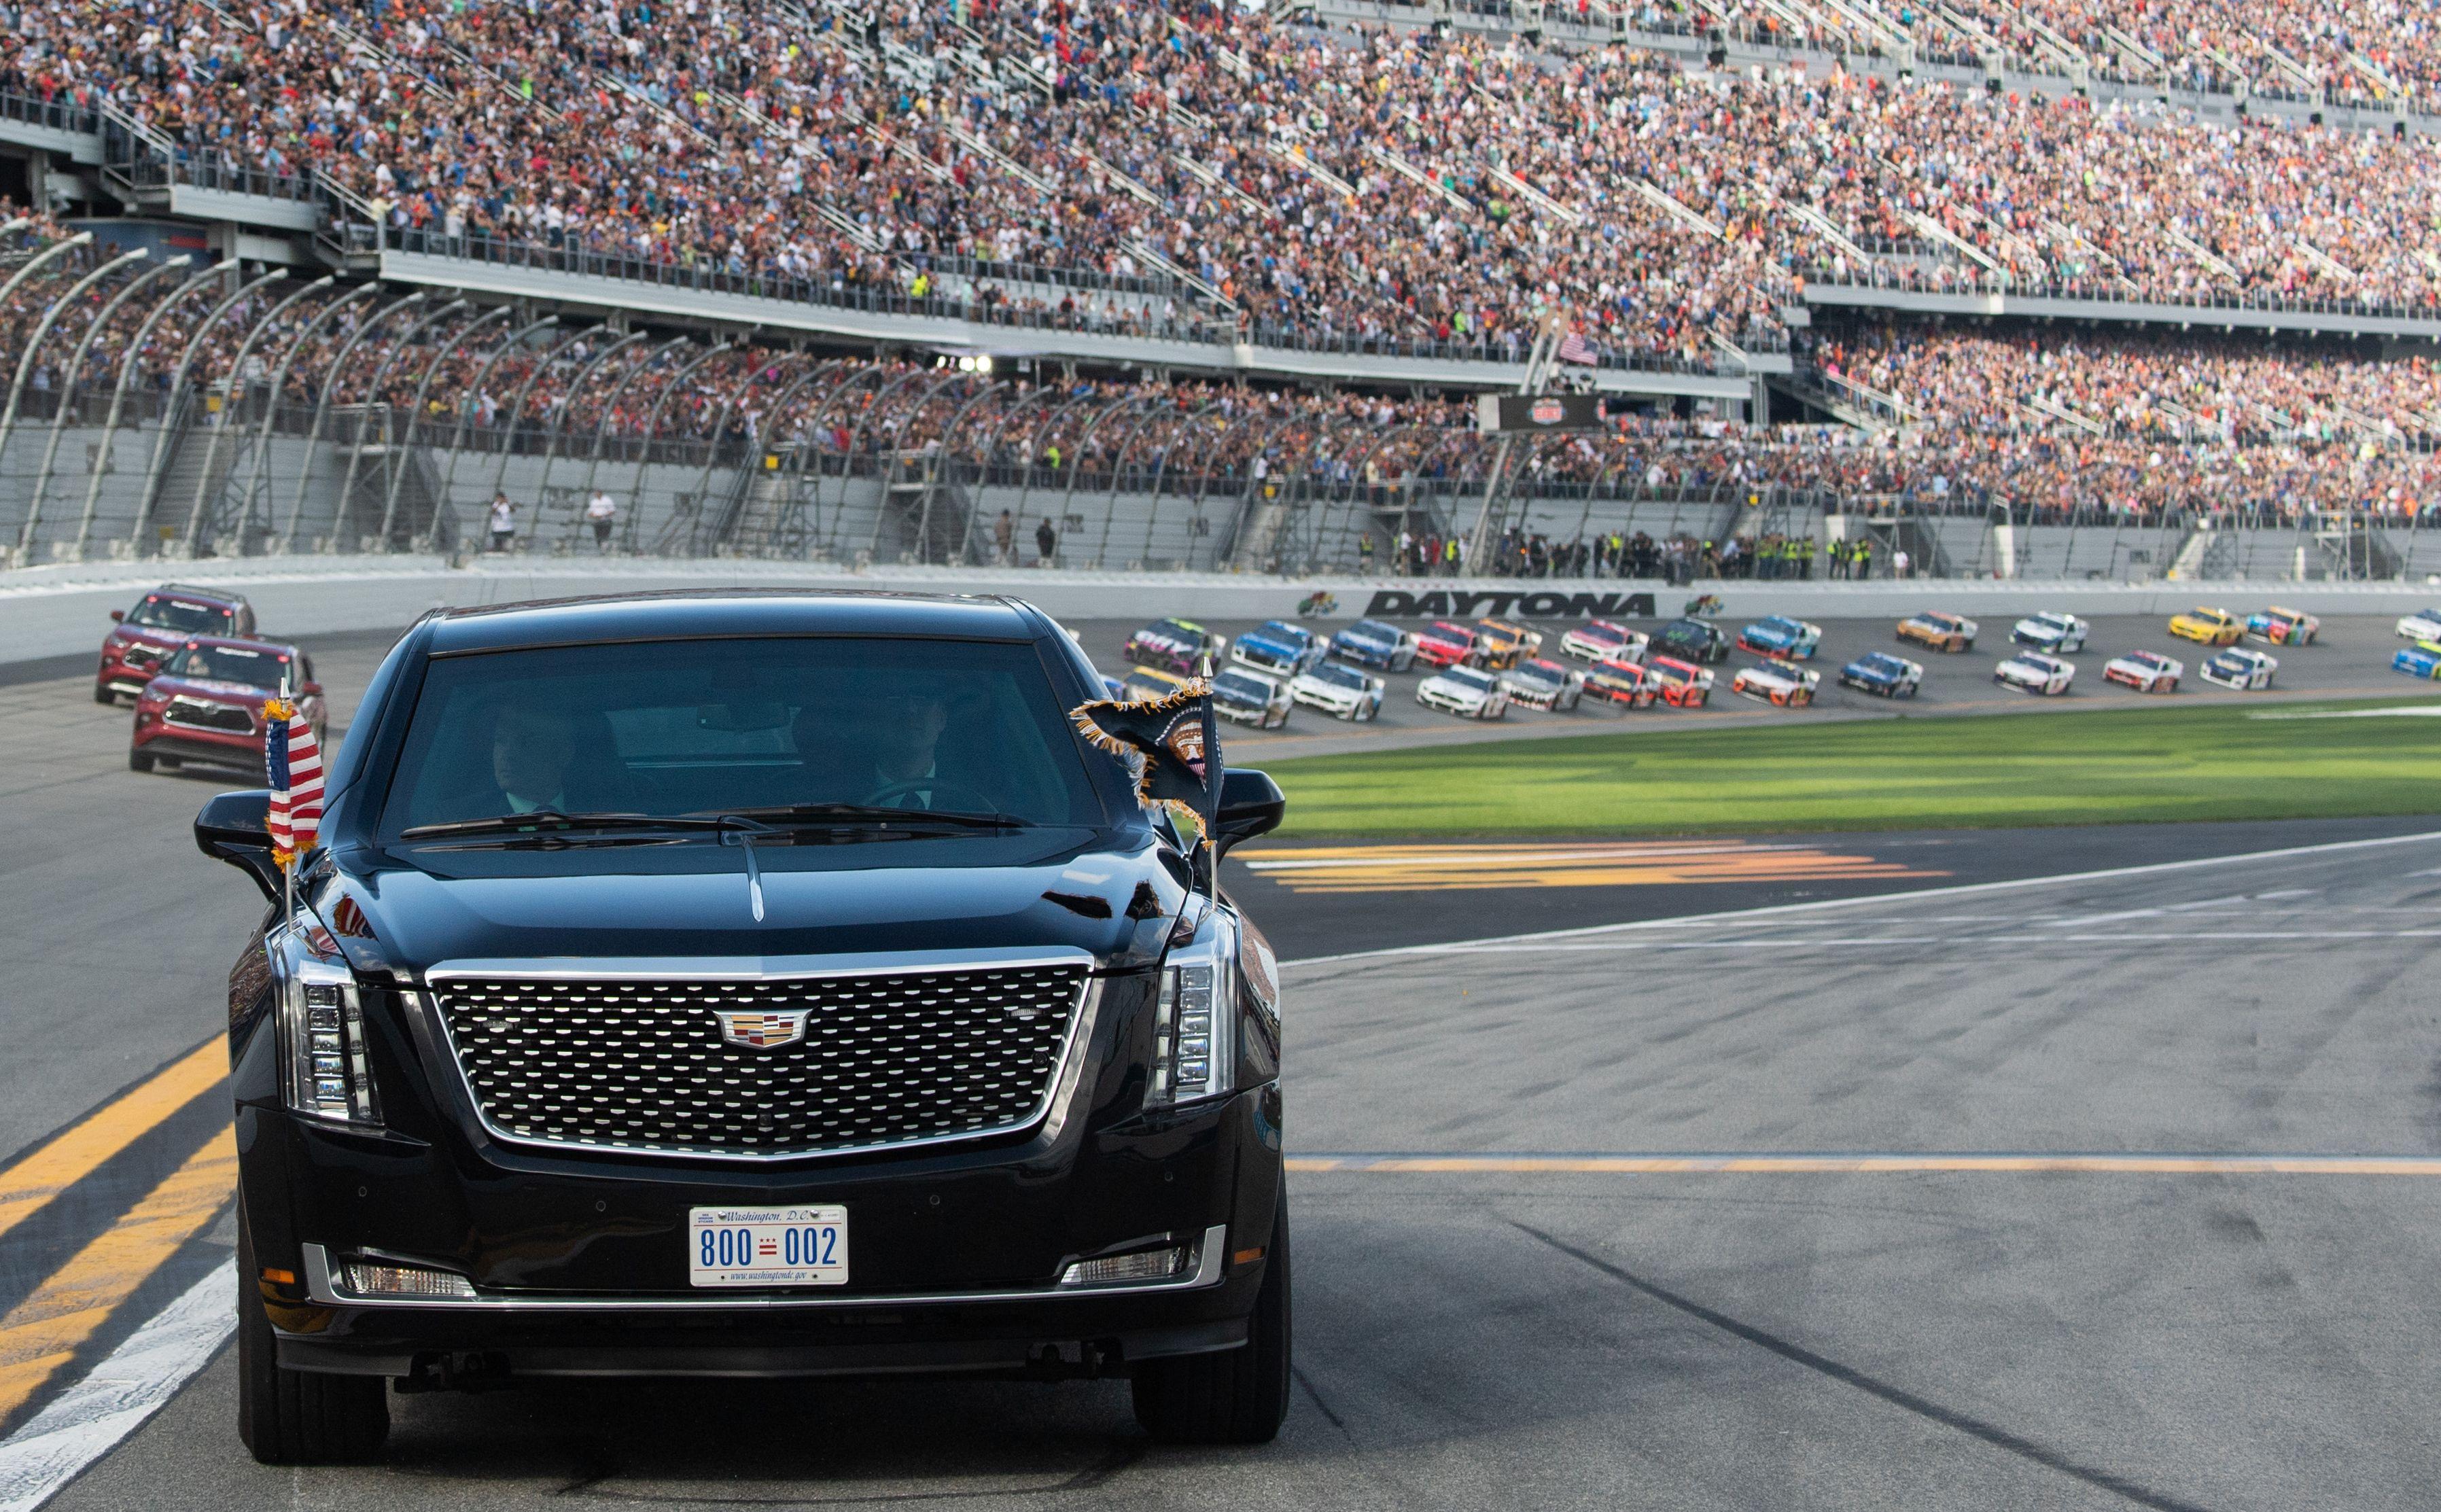 Trump takes presidential limousine for lap at Daytona 500 - Axios